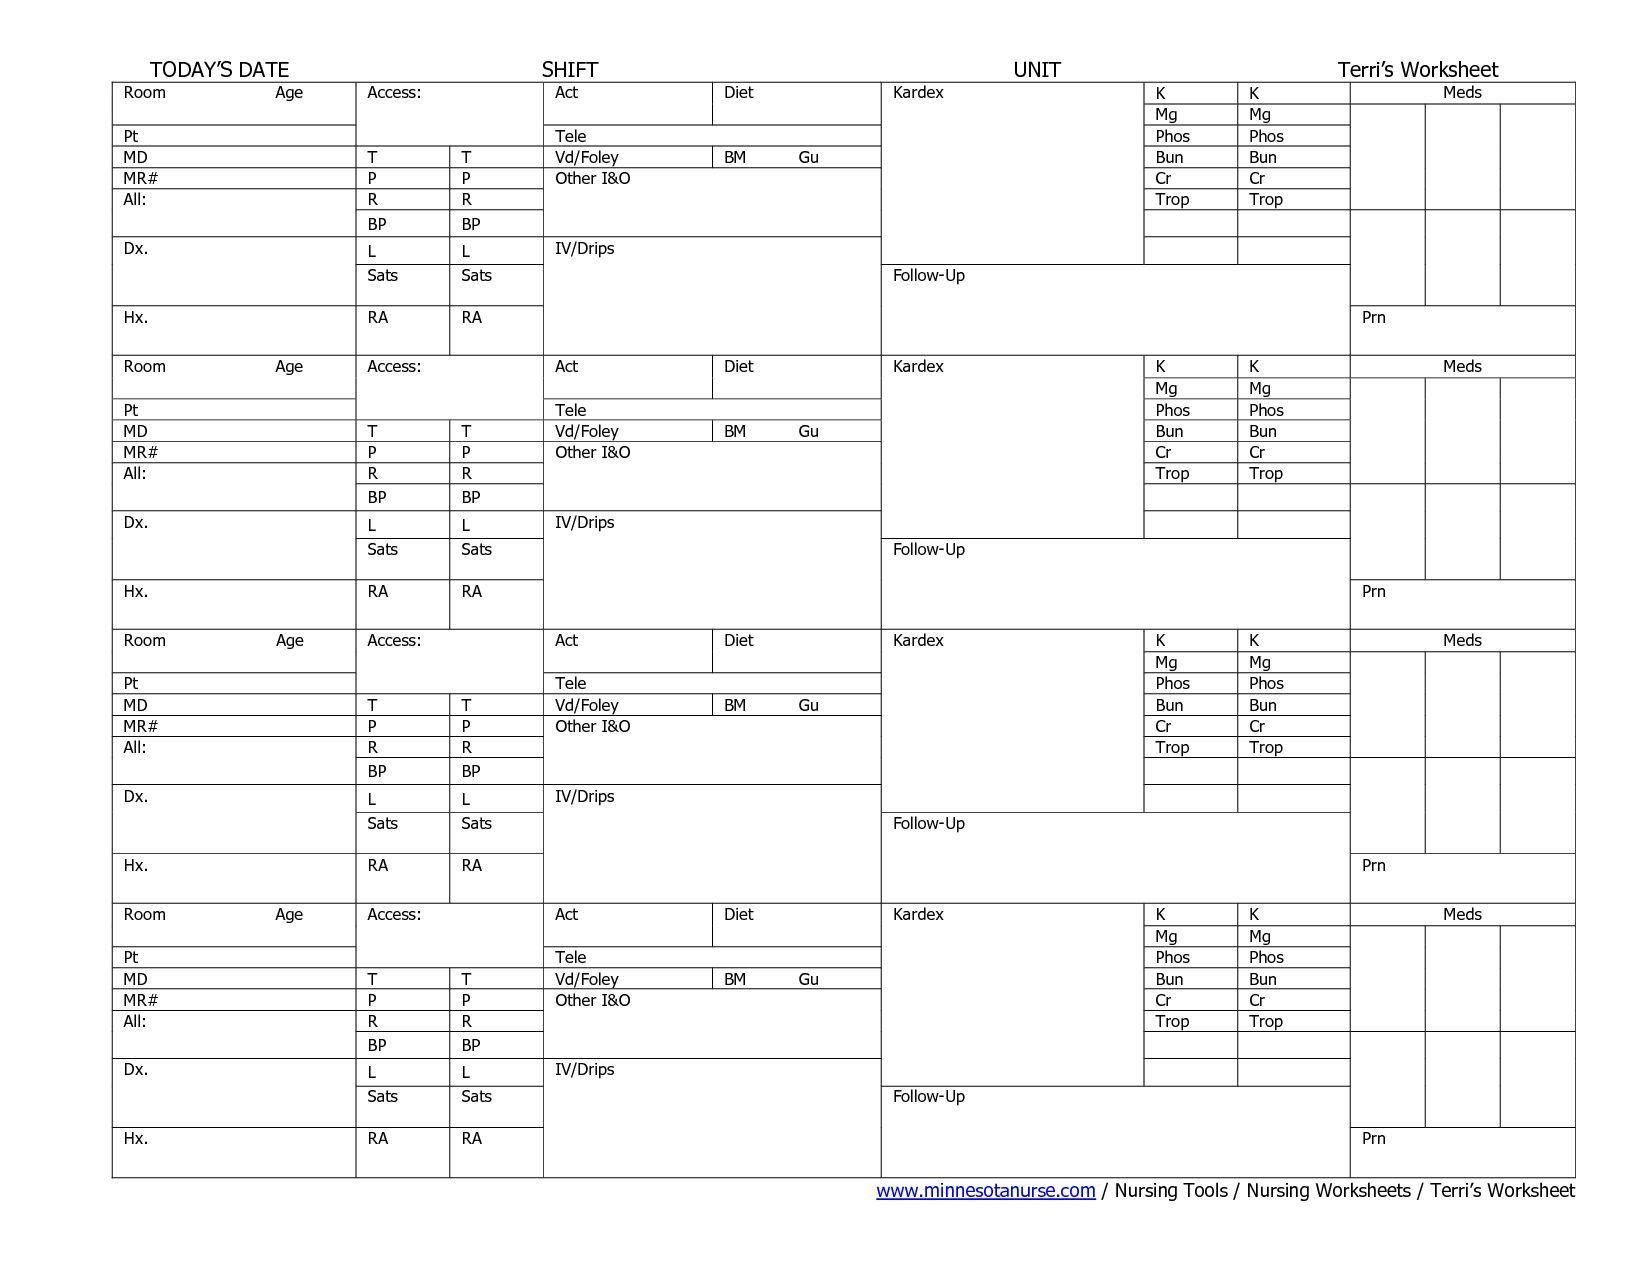 Nurses Worksheets Ukrandiffusion In 2021 Math Worksheets Printable Math Worksheets Worksheets